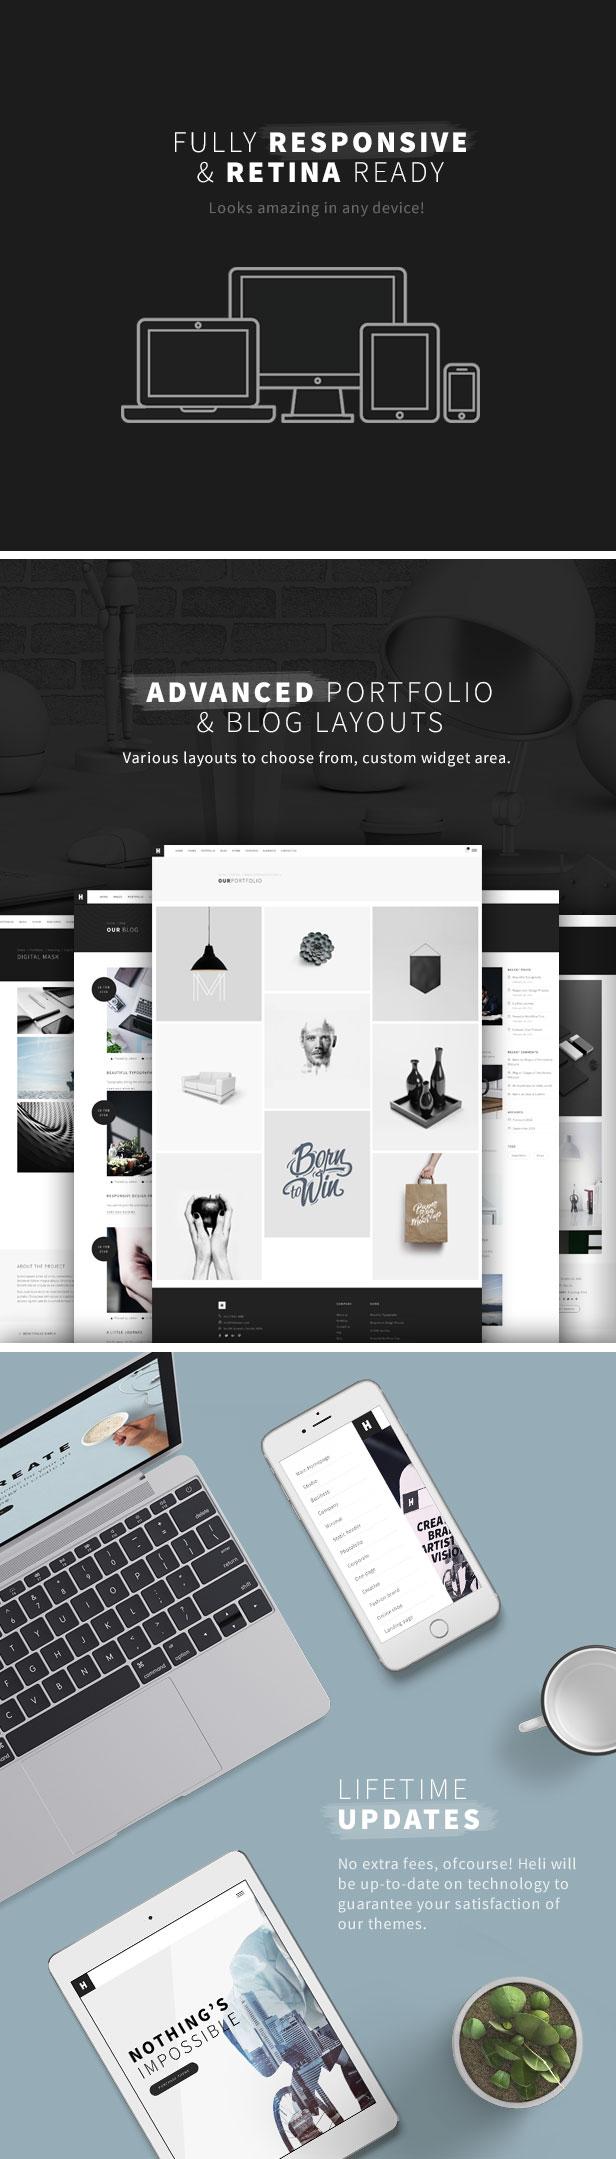 rMinimal Creative Black and White WordPress Theme - esponsive & retina